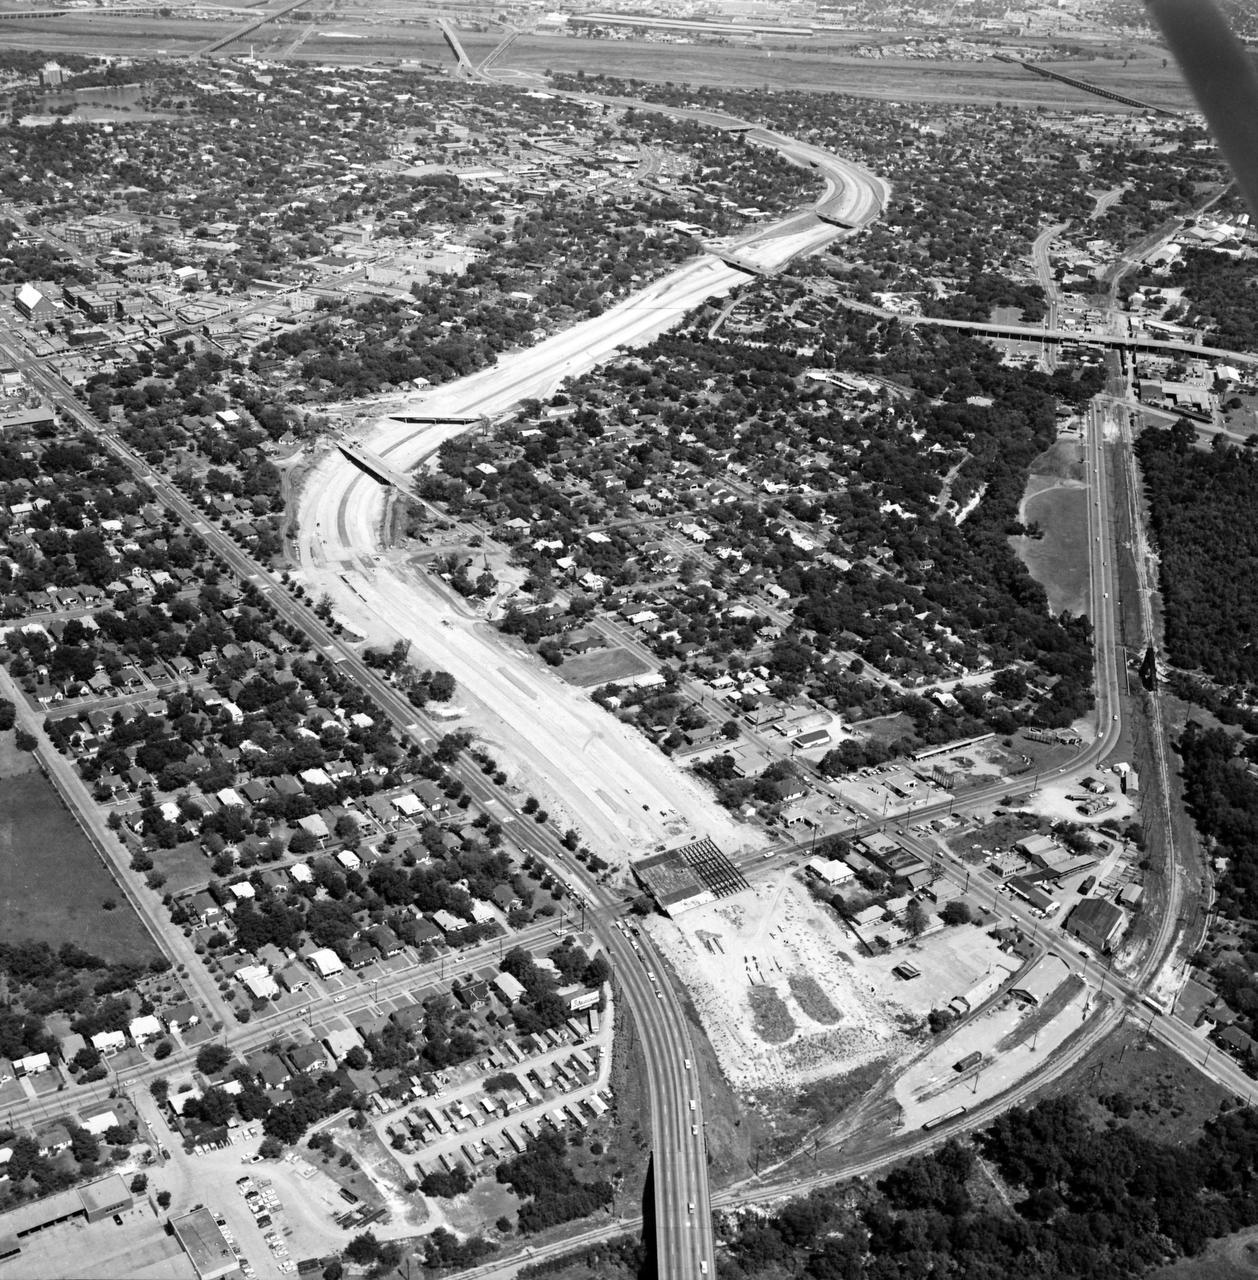 Interstate Injustice: Plowing Highways Through Minority